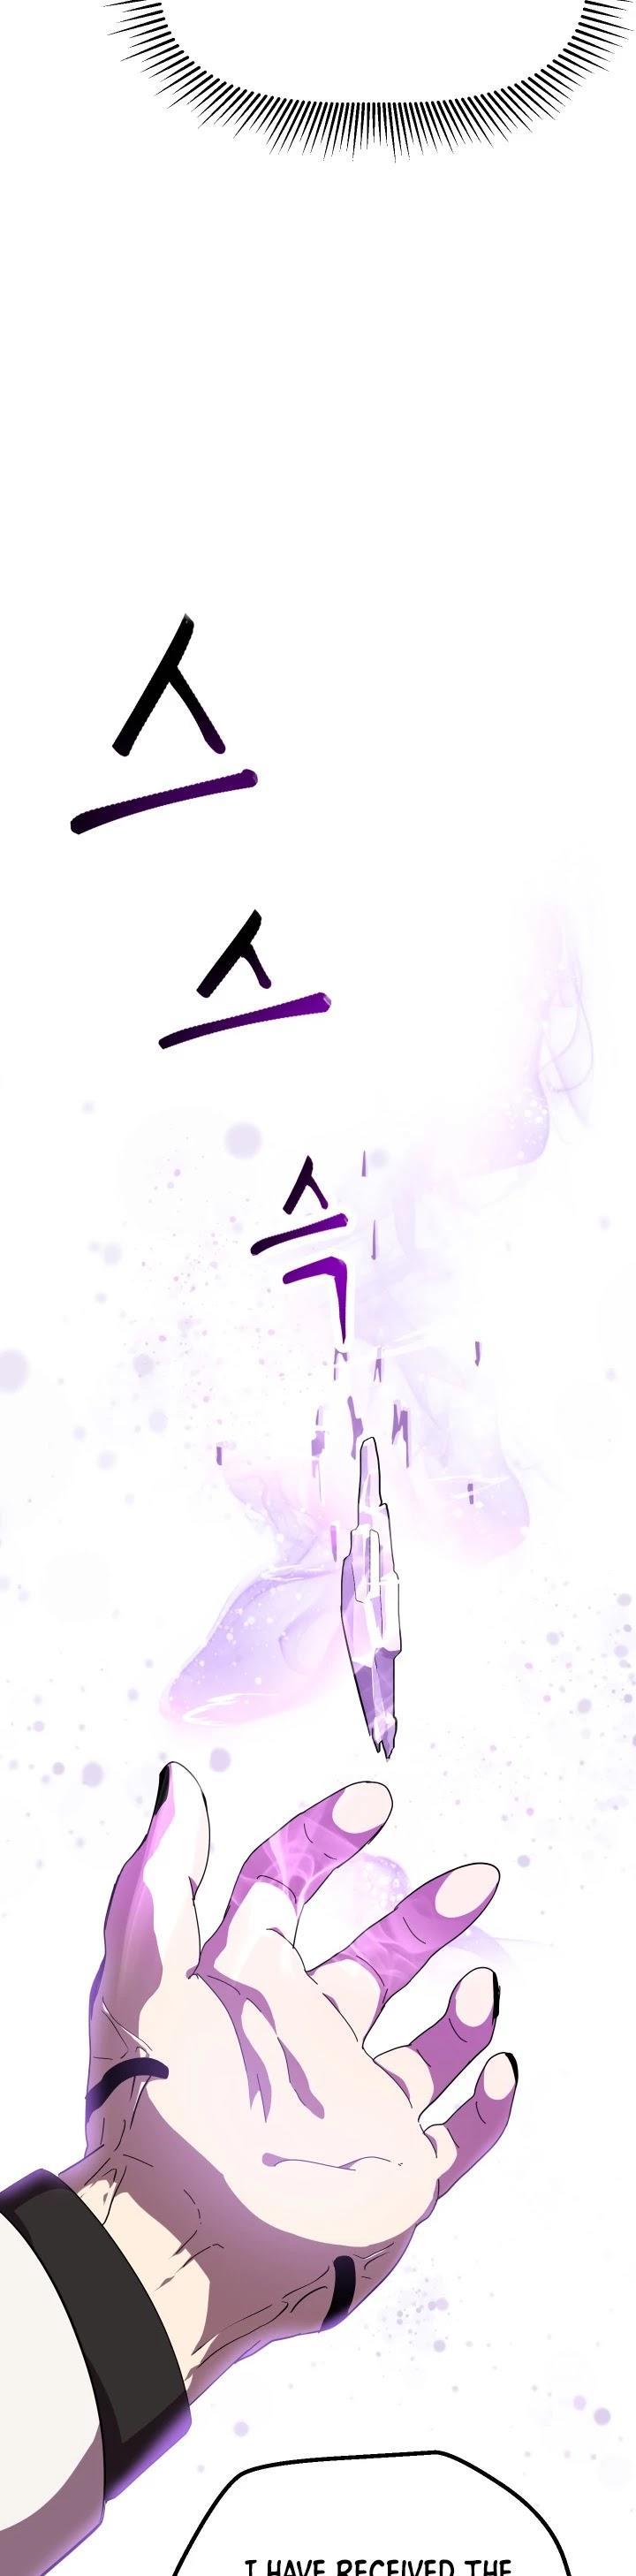 Survival Story Of A Sword King In A Fantasy World Chapter 53 page 66 - Mangakakalots.com